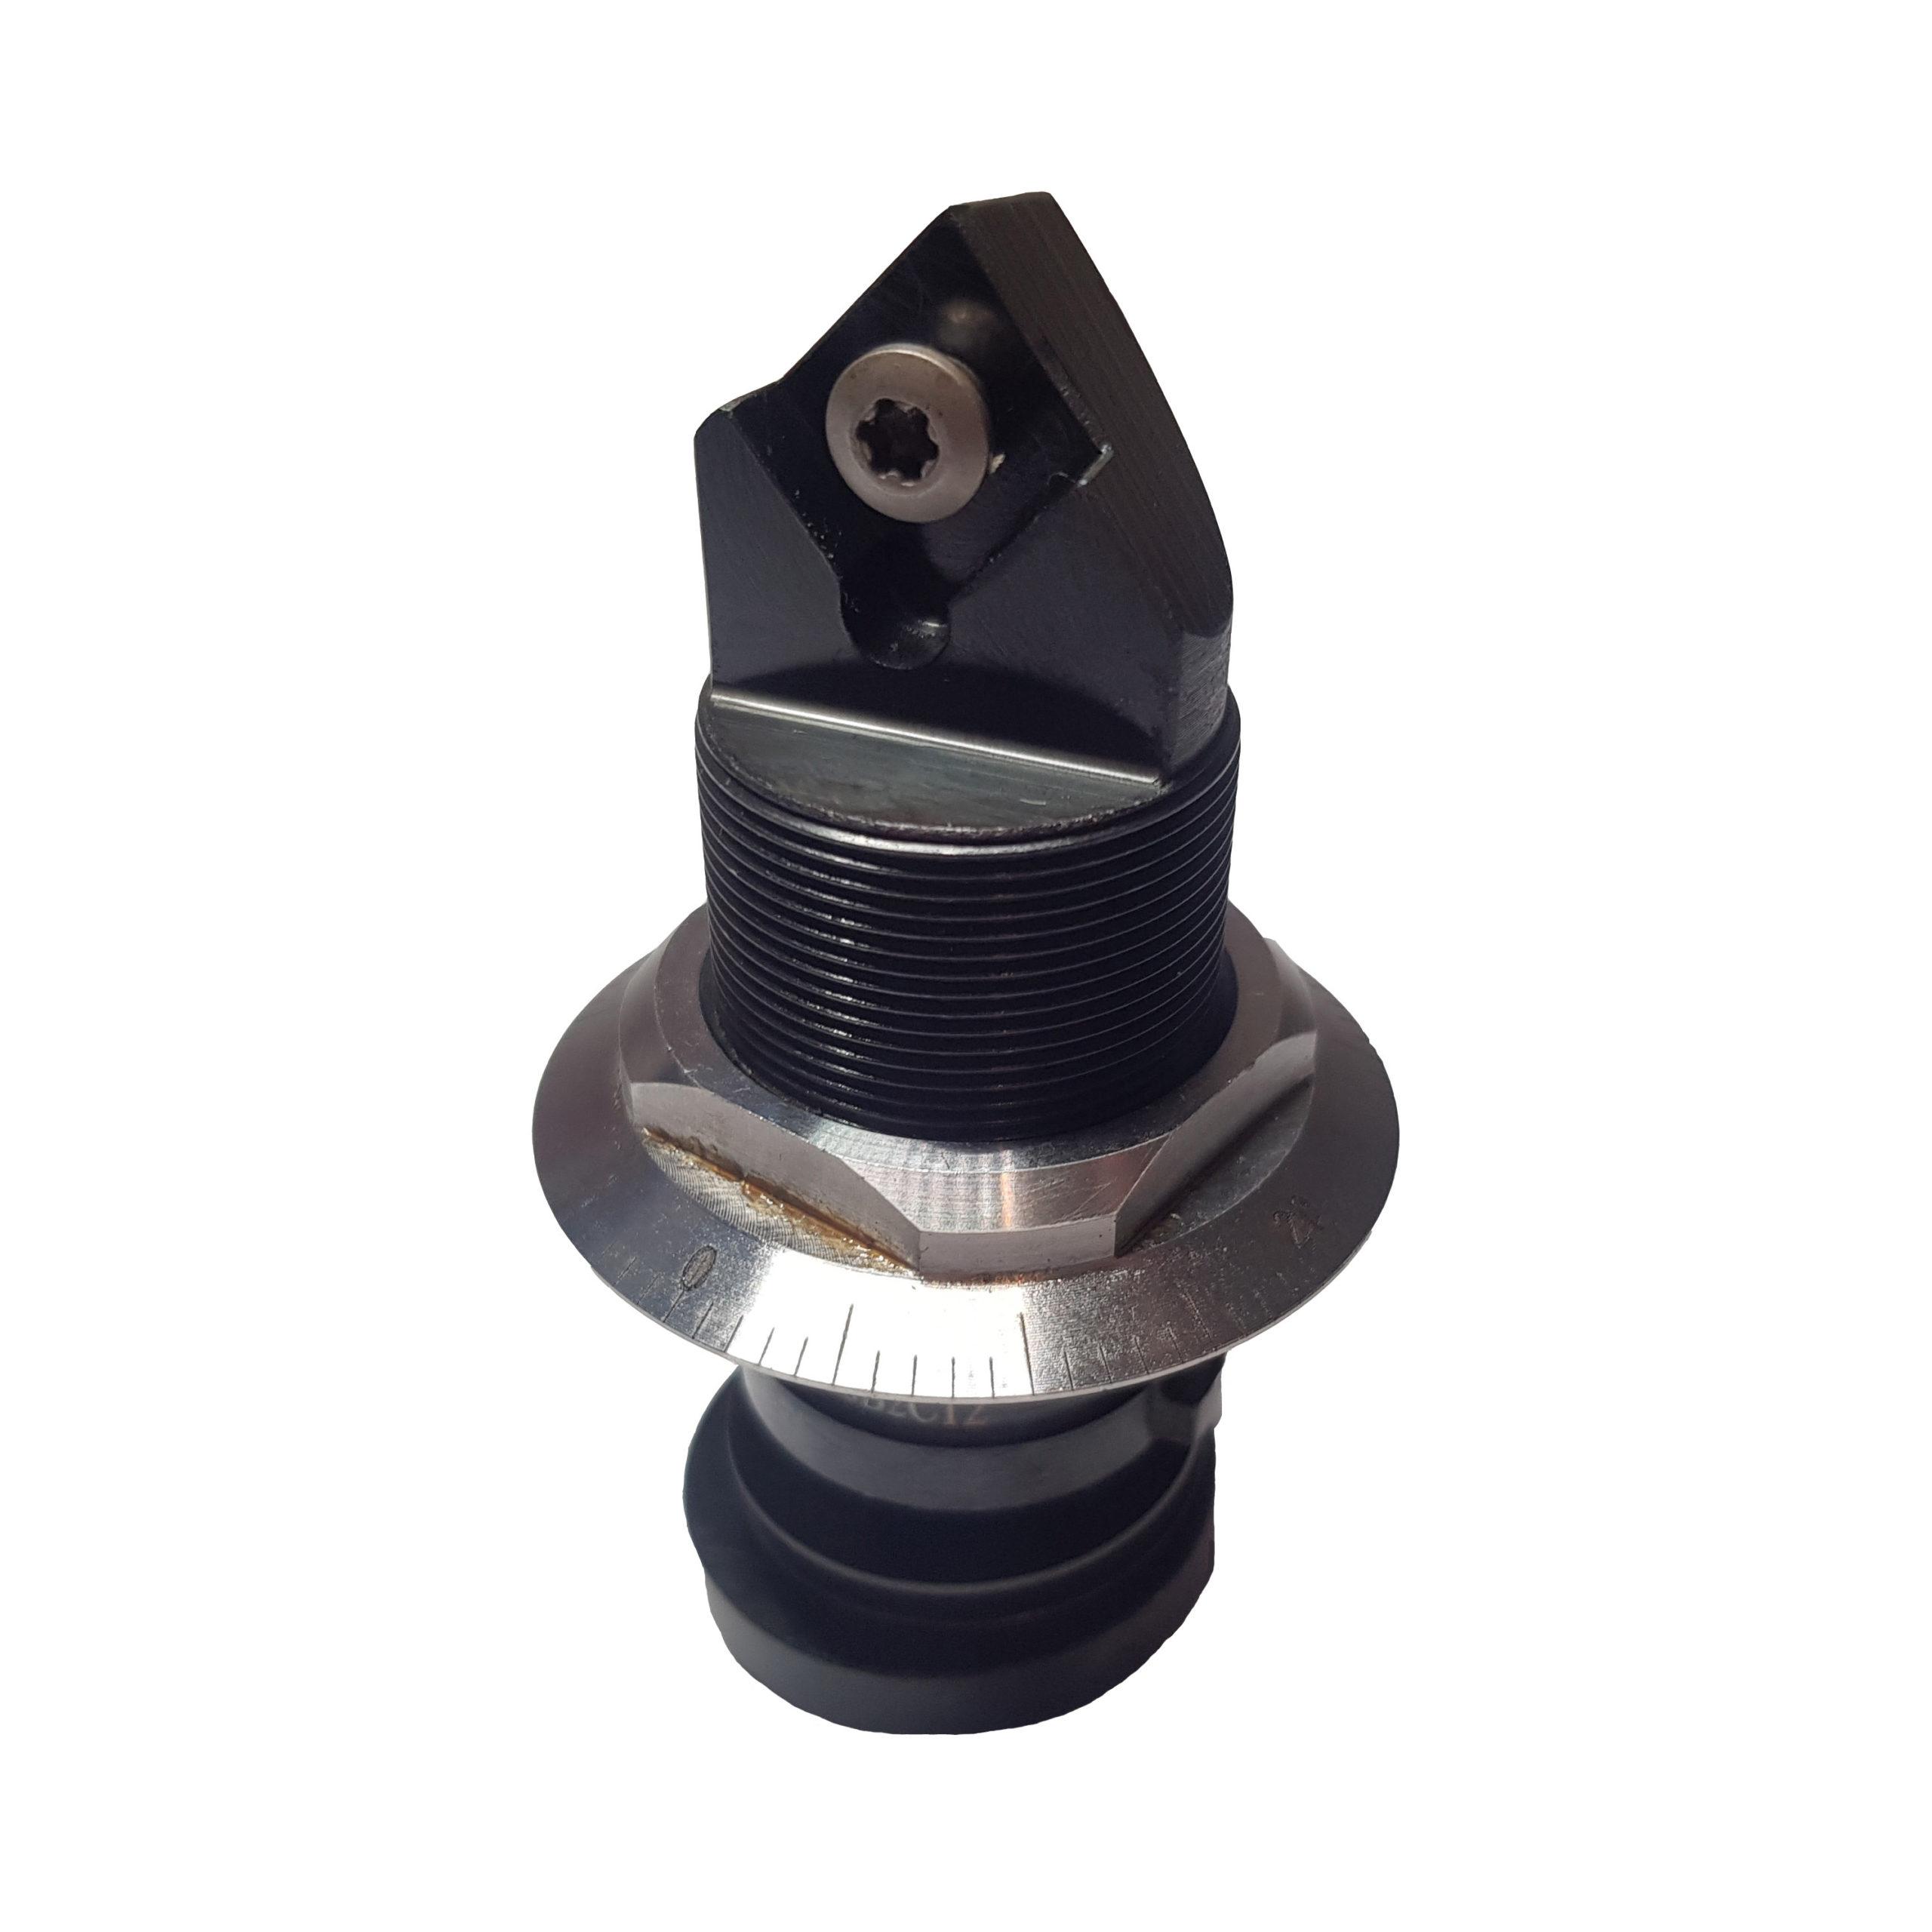 Image of Microbore ISO 80° Rhomboid Indexable Unit M10B2C12-80